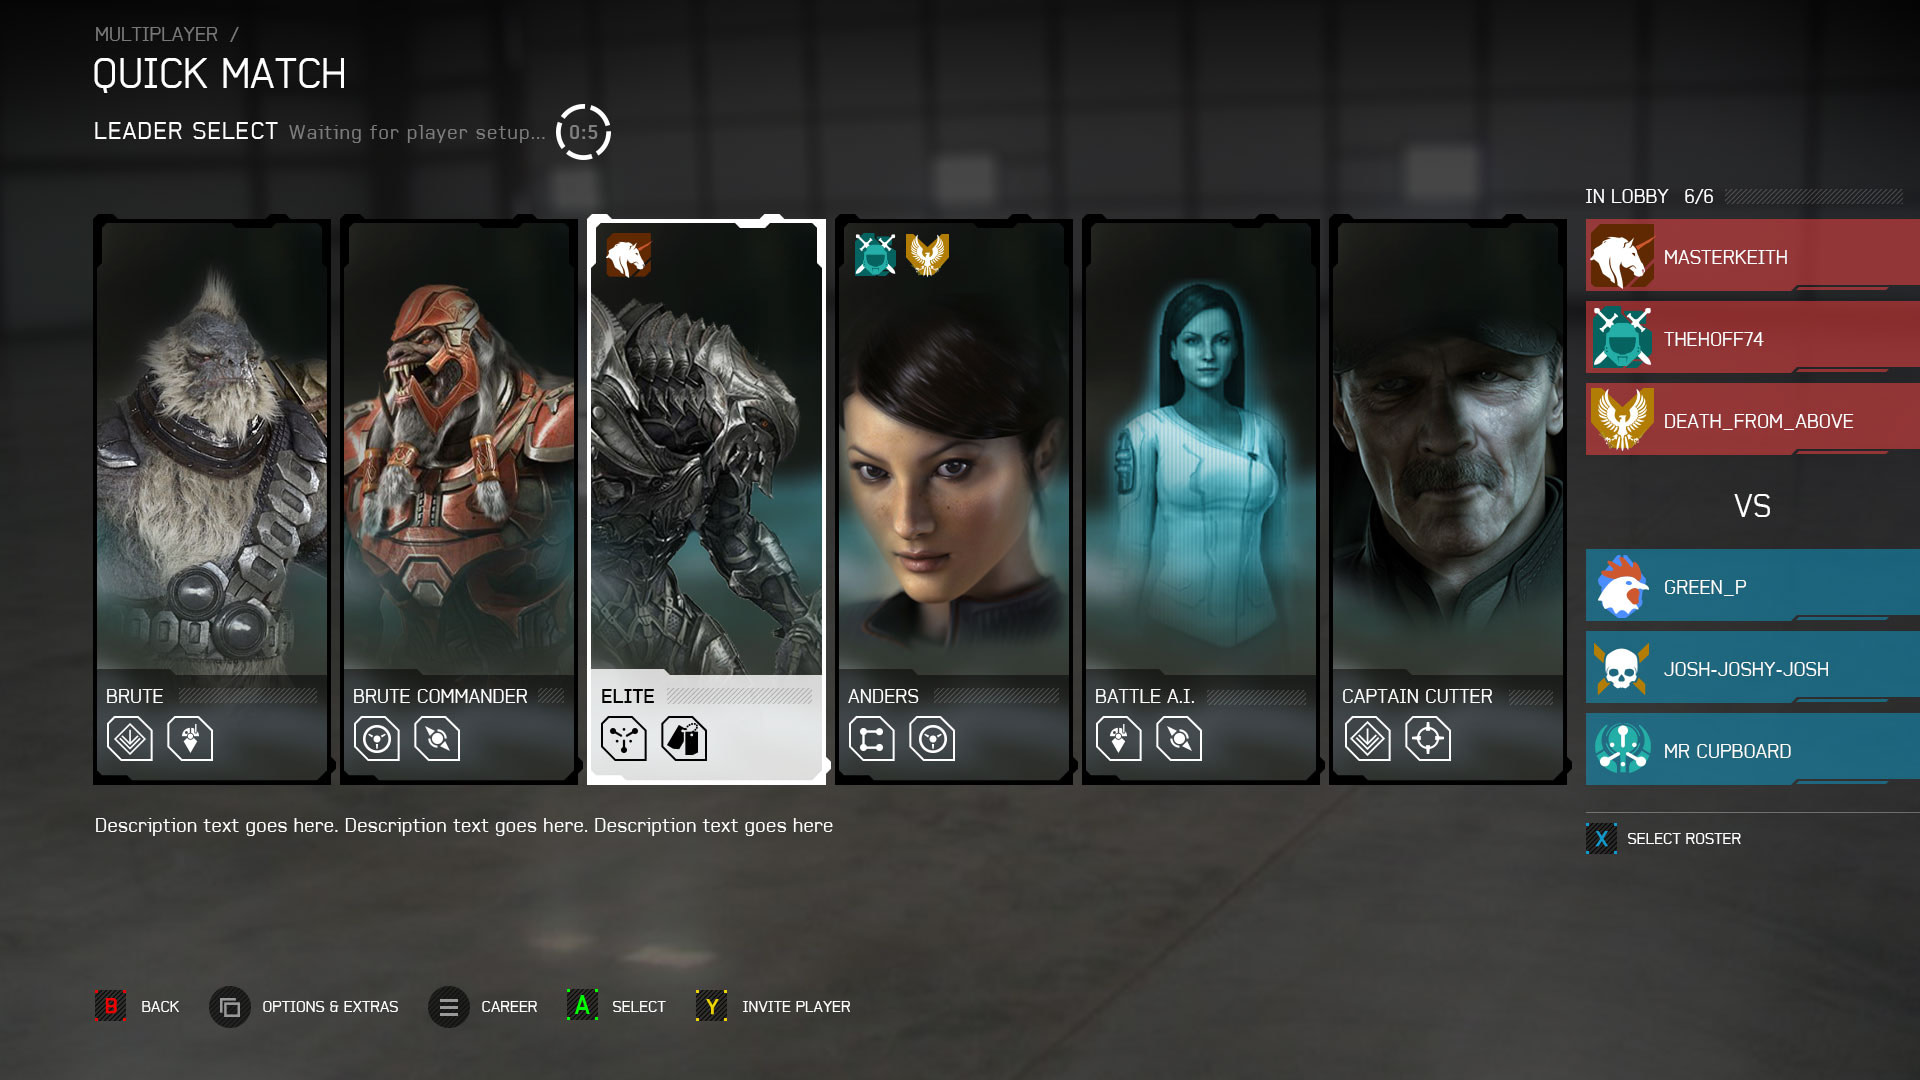 Halo Wars 2 Quick Match